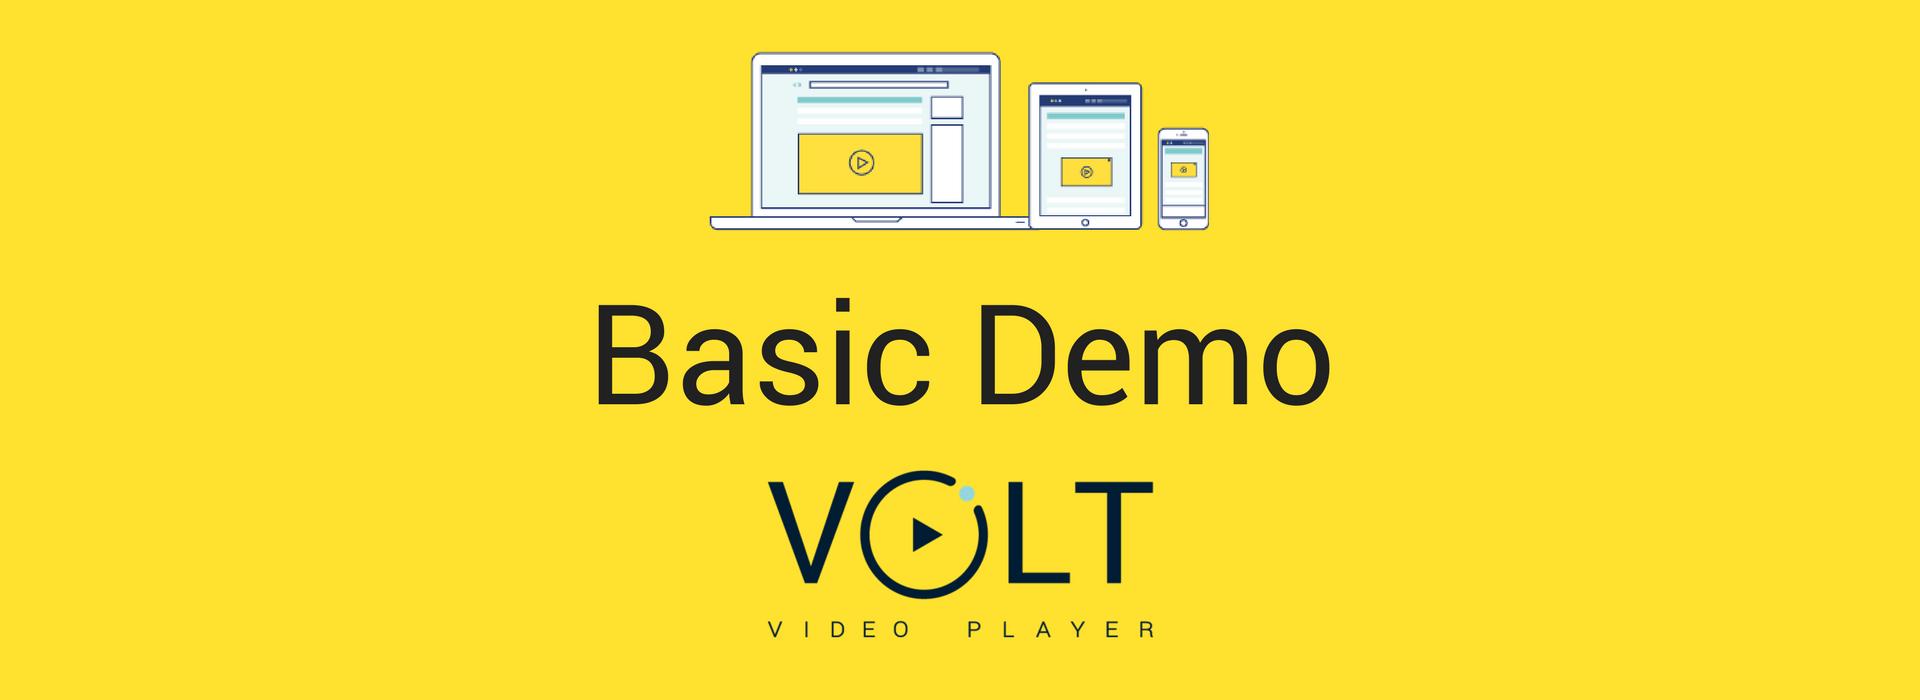 [object object] VOLT Basic Demo Premium Demo 3